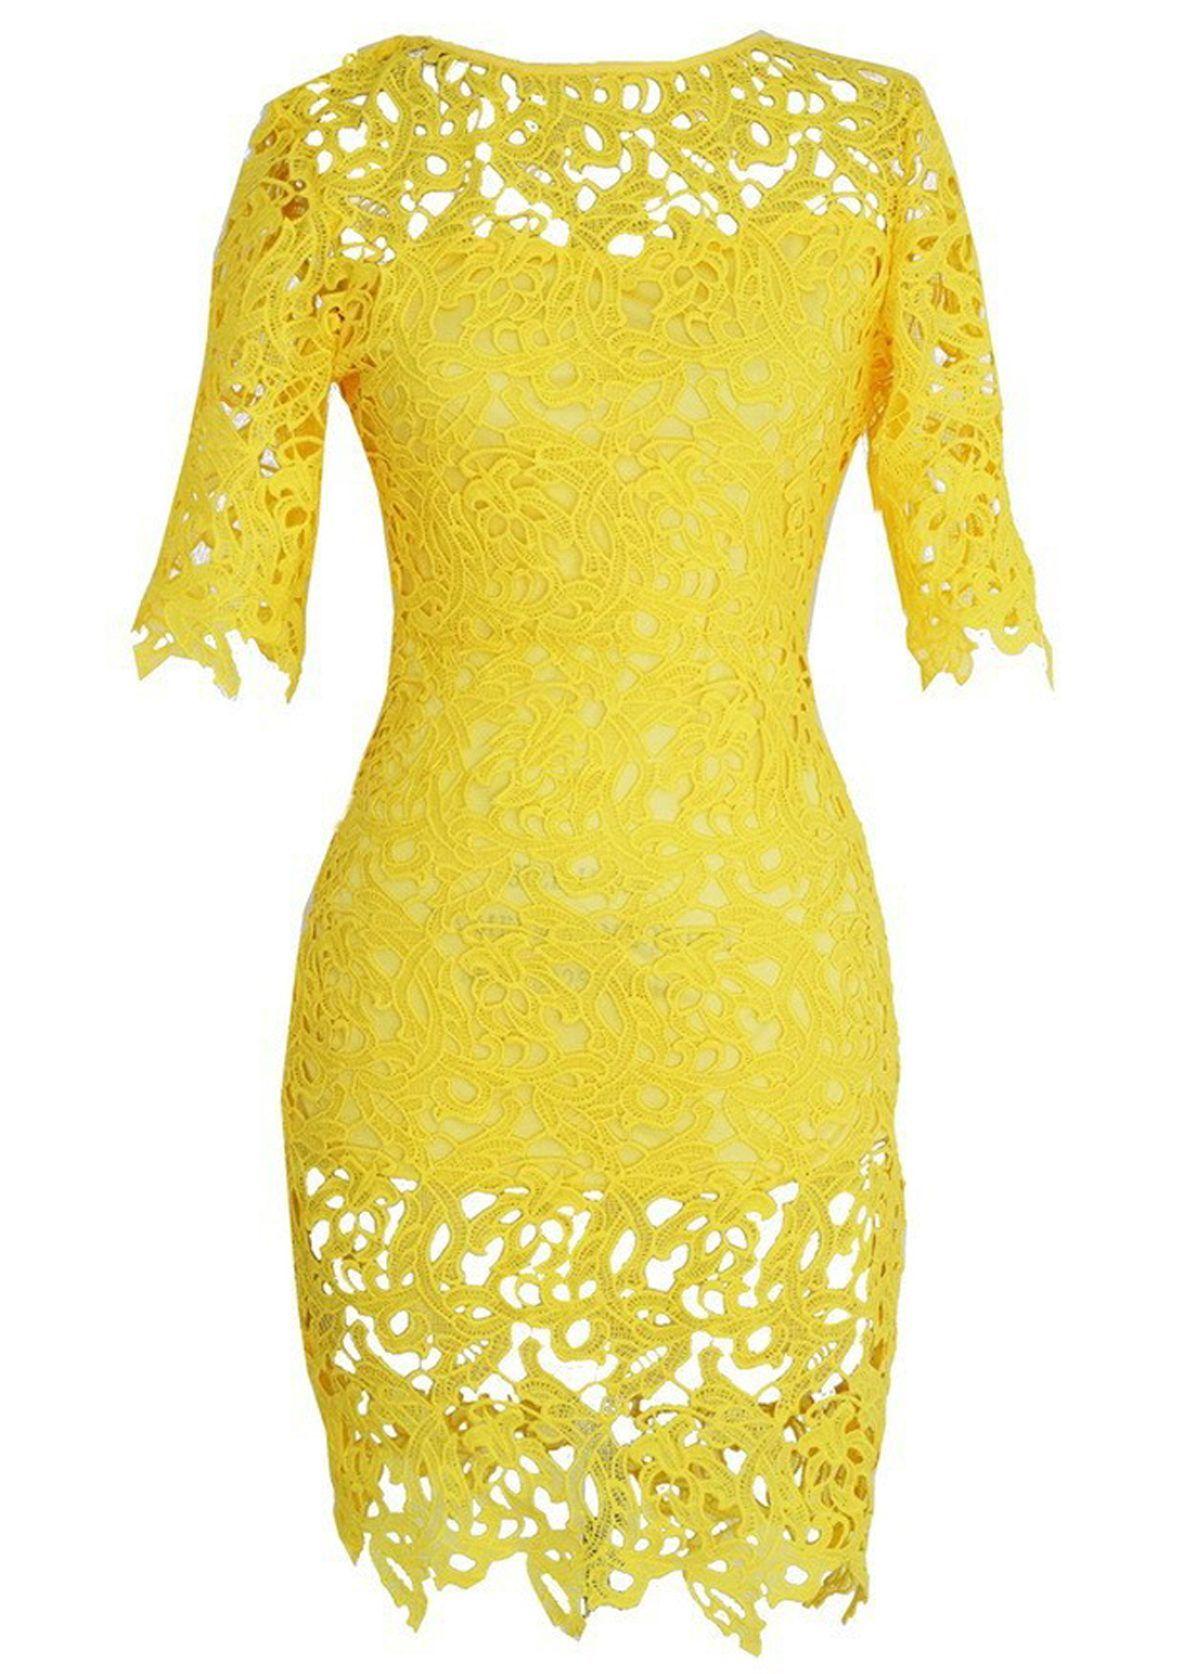 Lace prom dresspencil prom dressfashion homecoming dresssexy